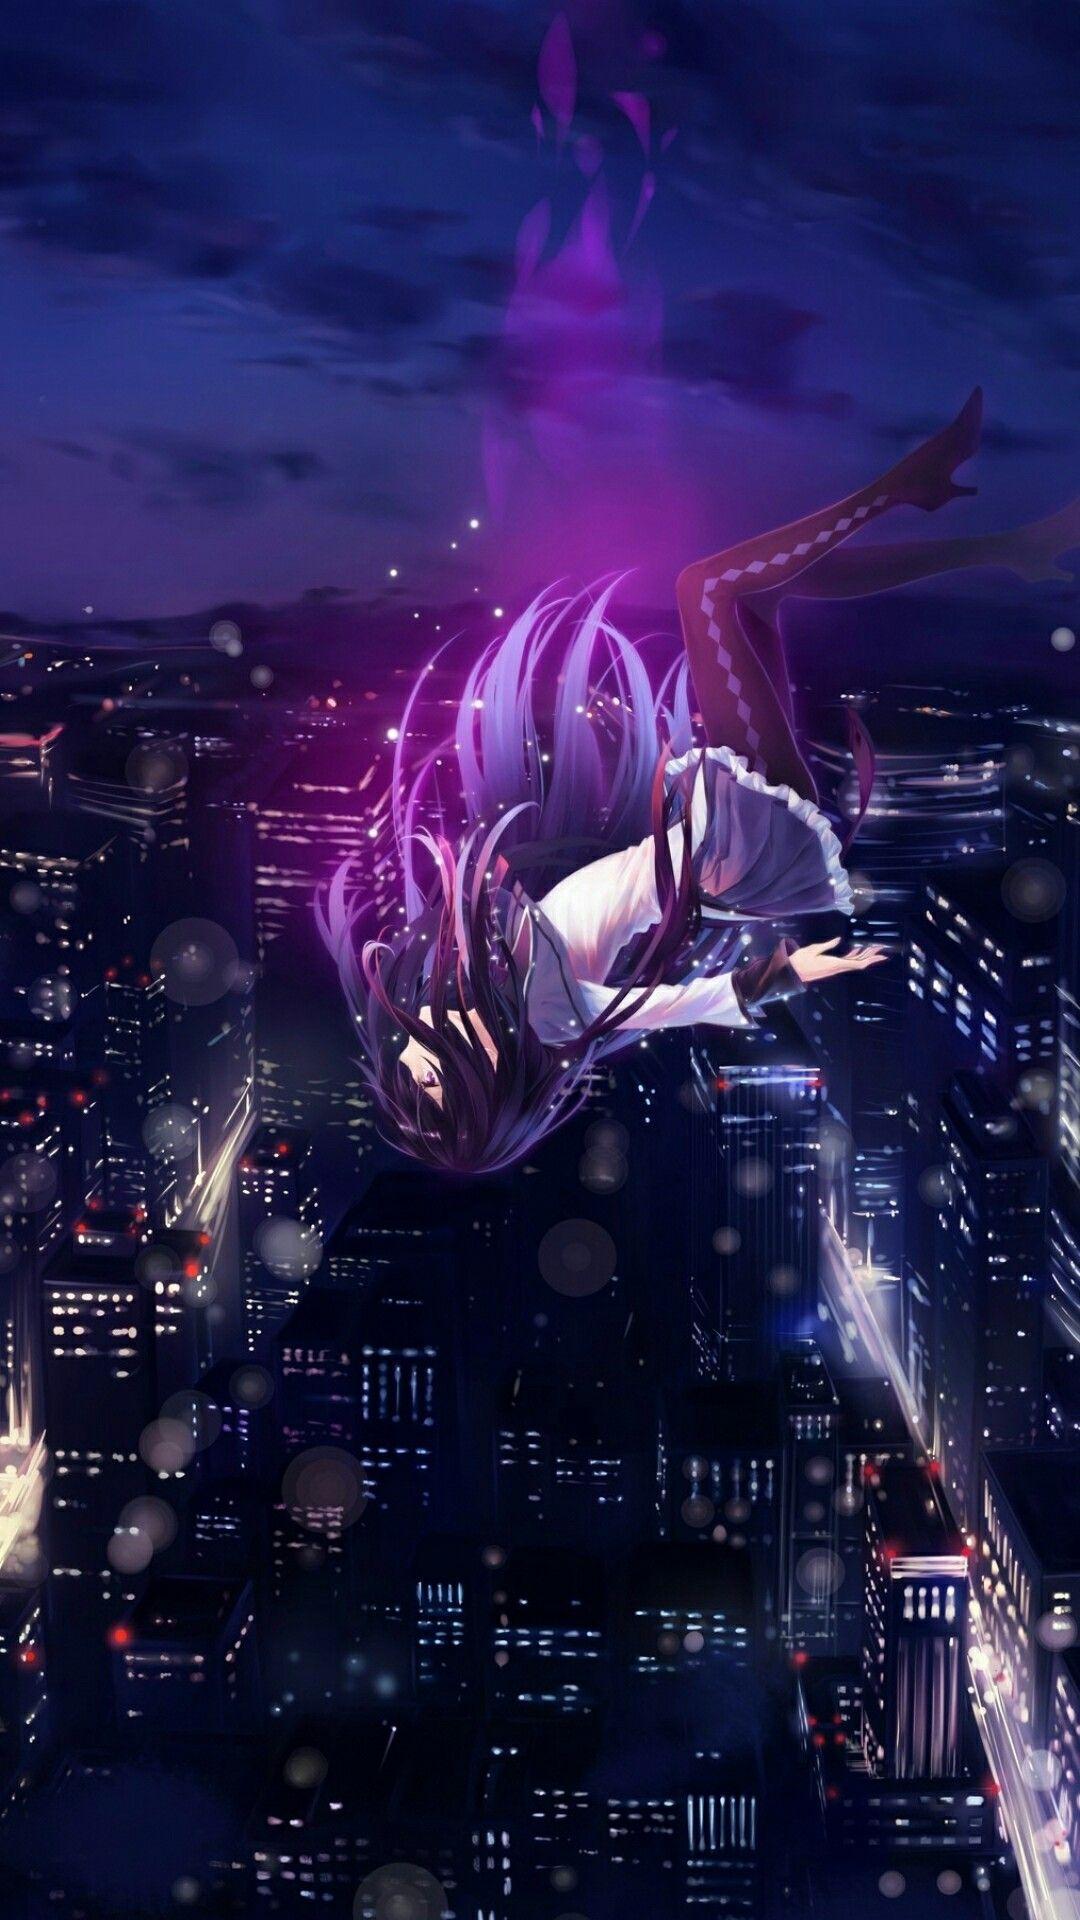 Pin by Nasim Ariaie on wallpaper anime Anime wallpaper